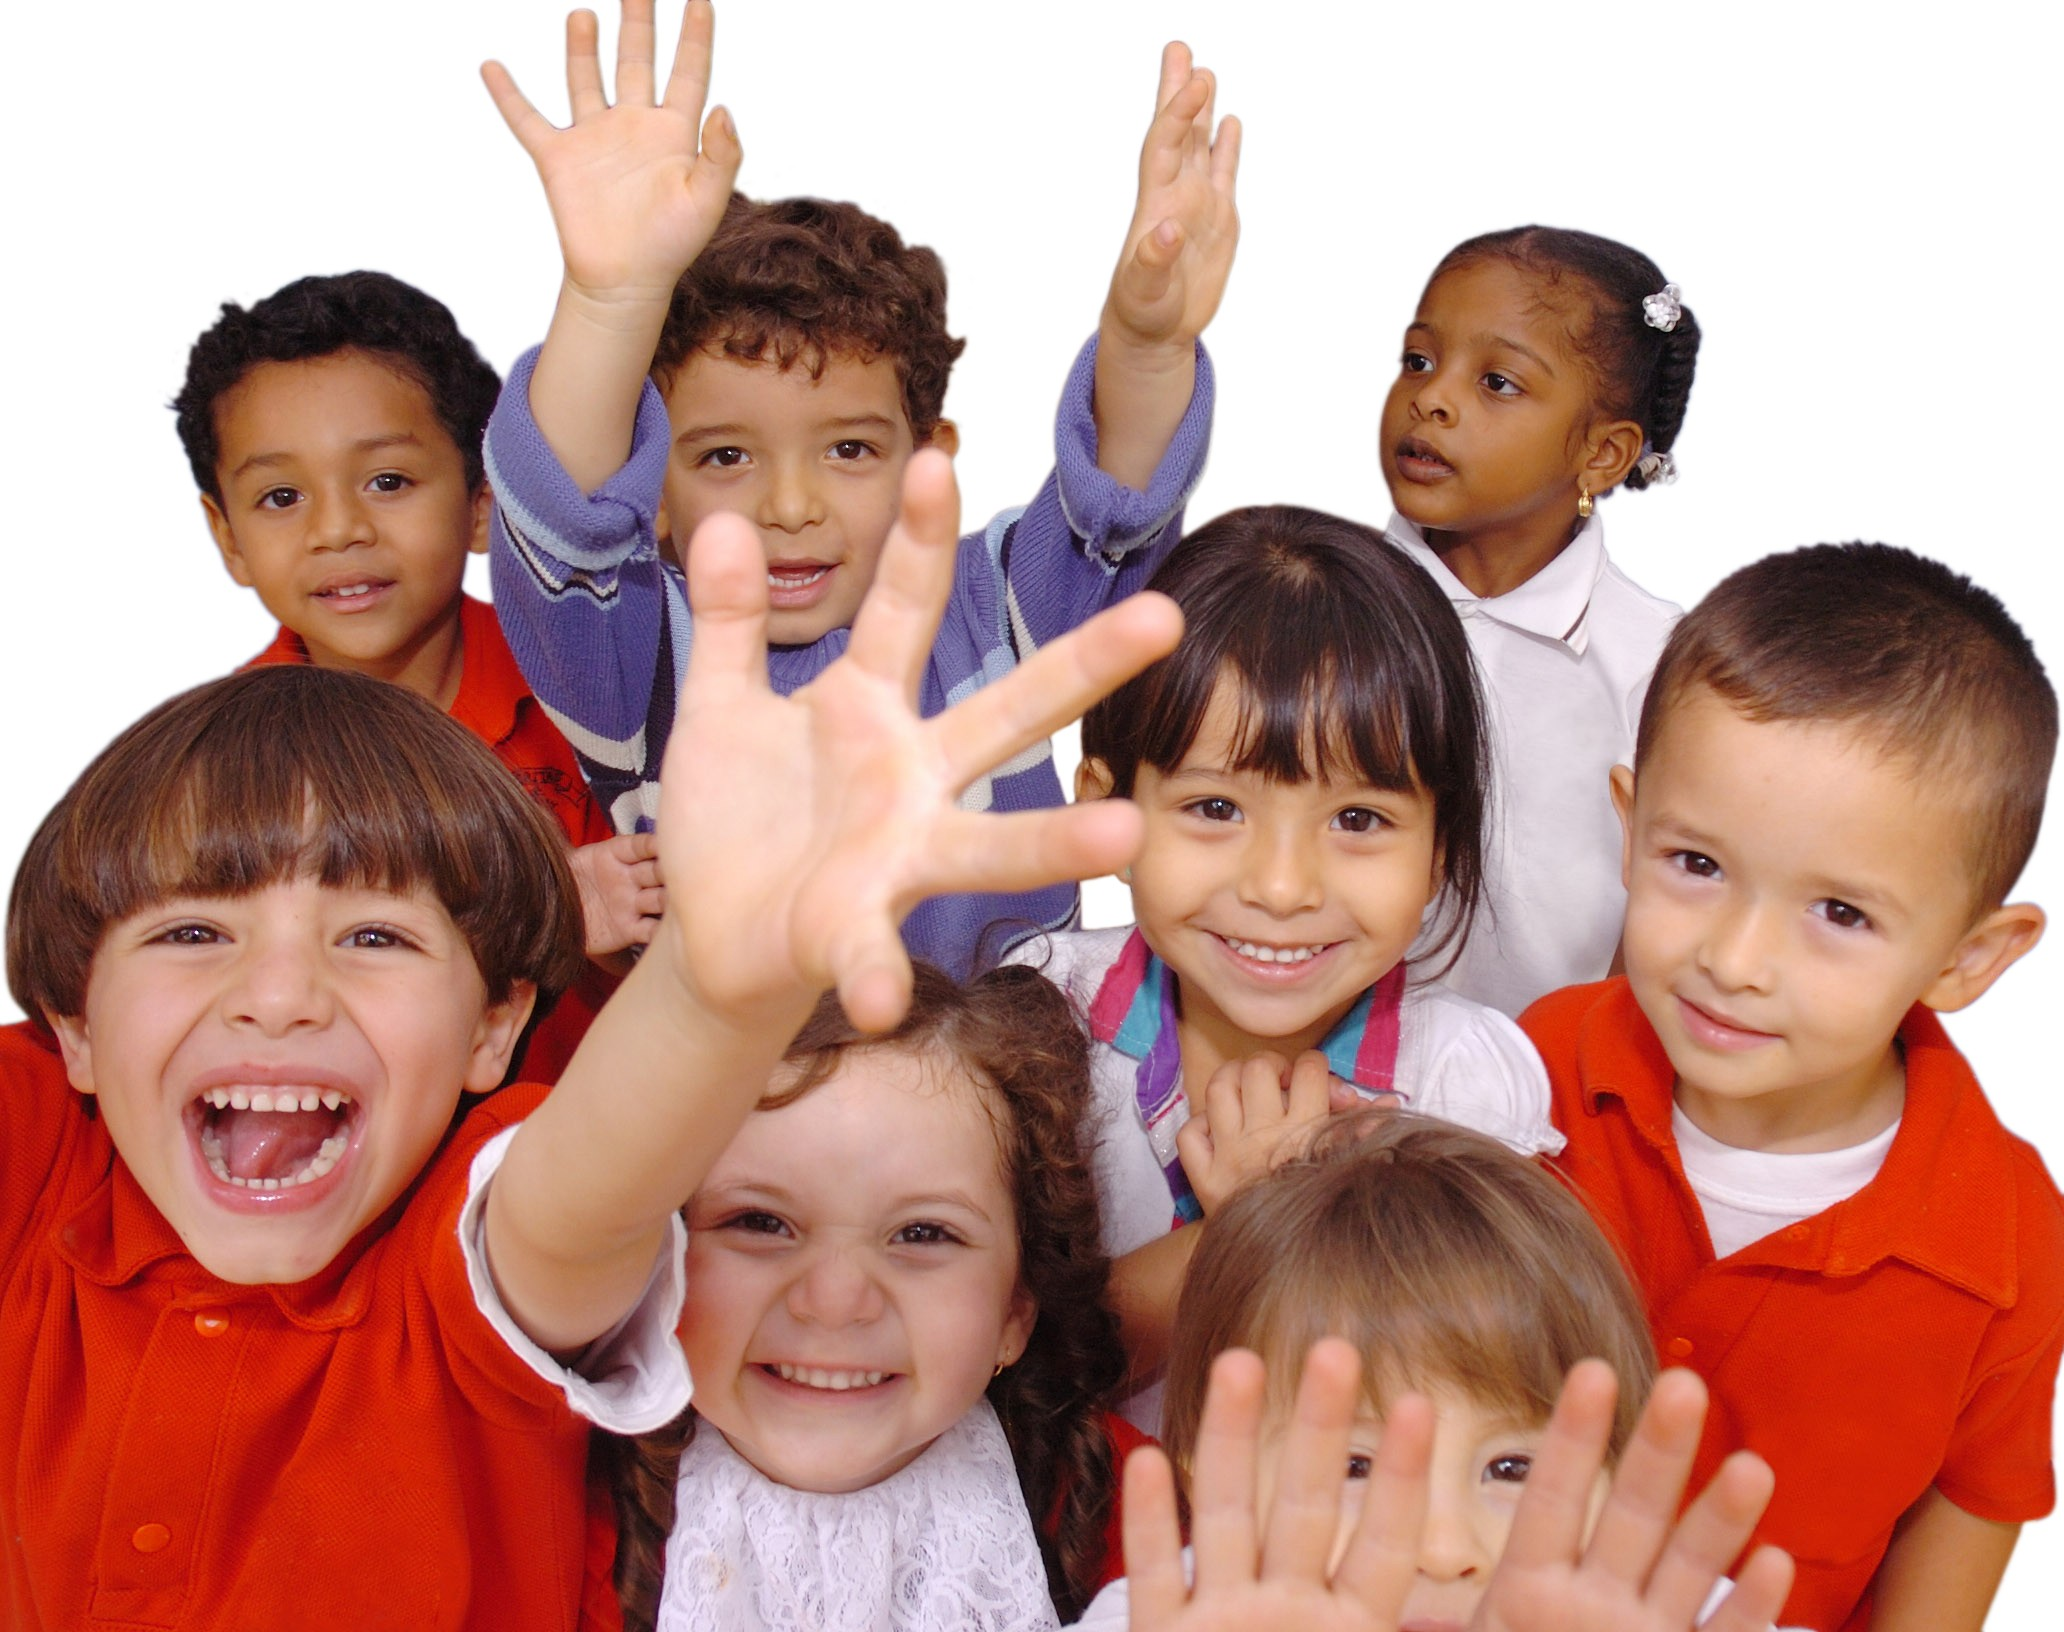 grupos escolares